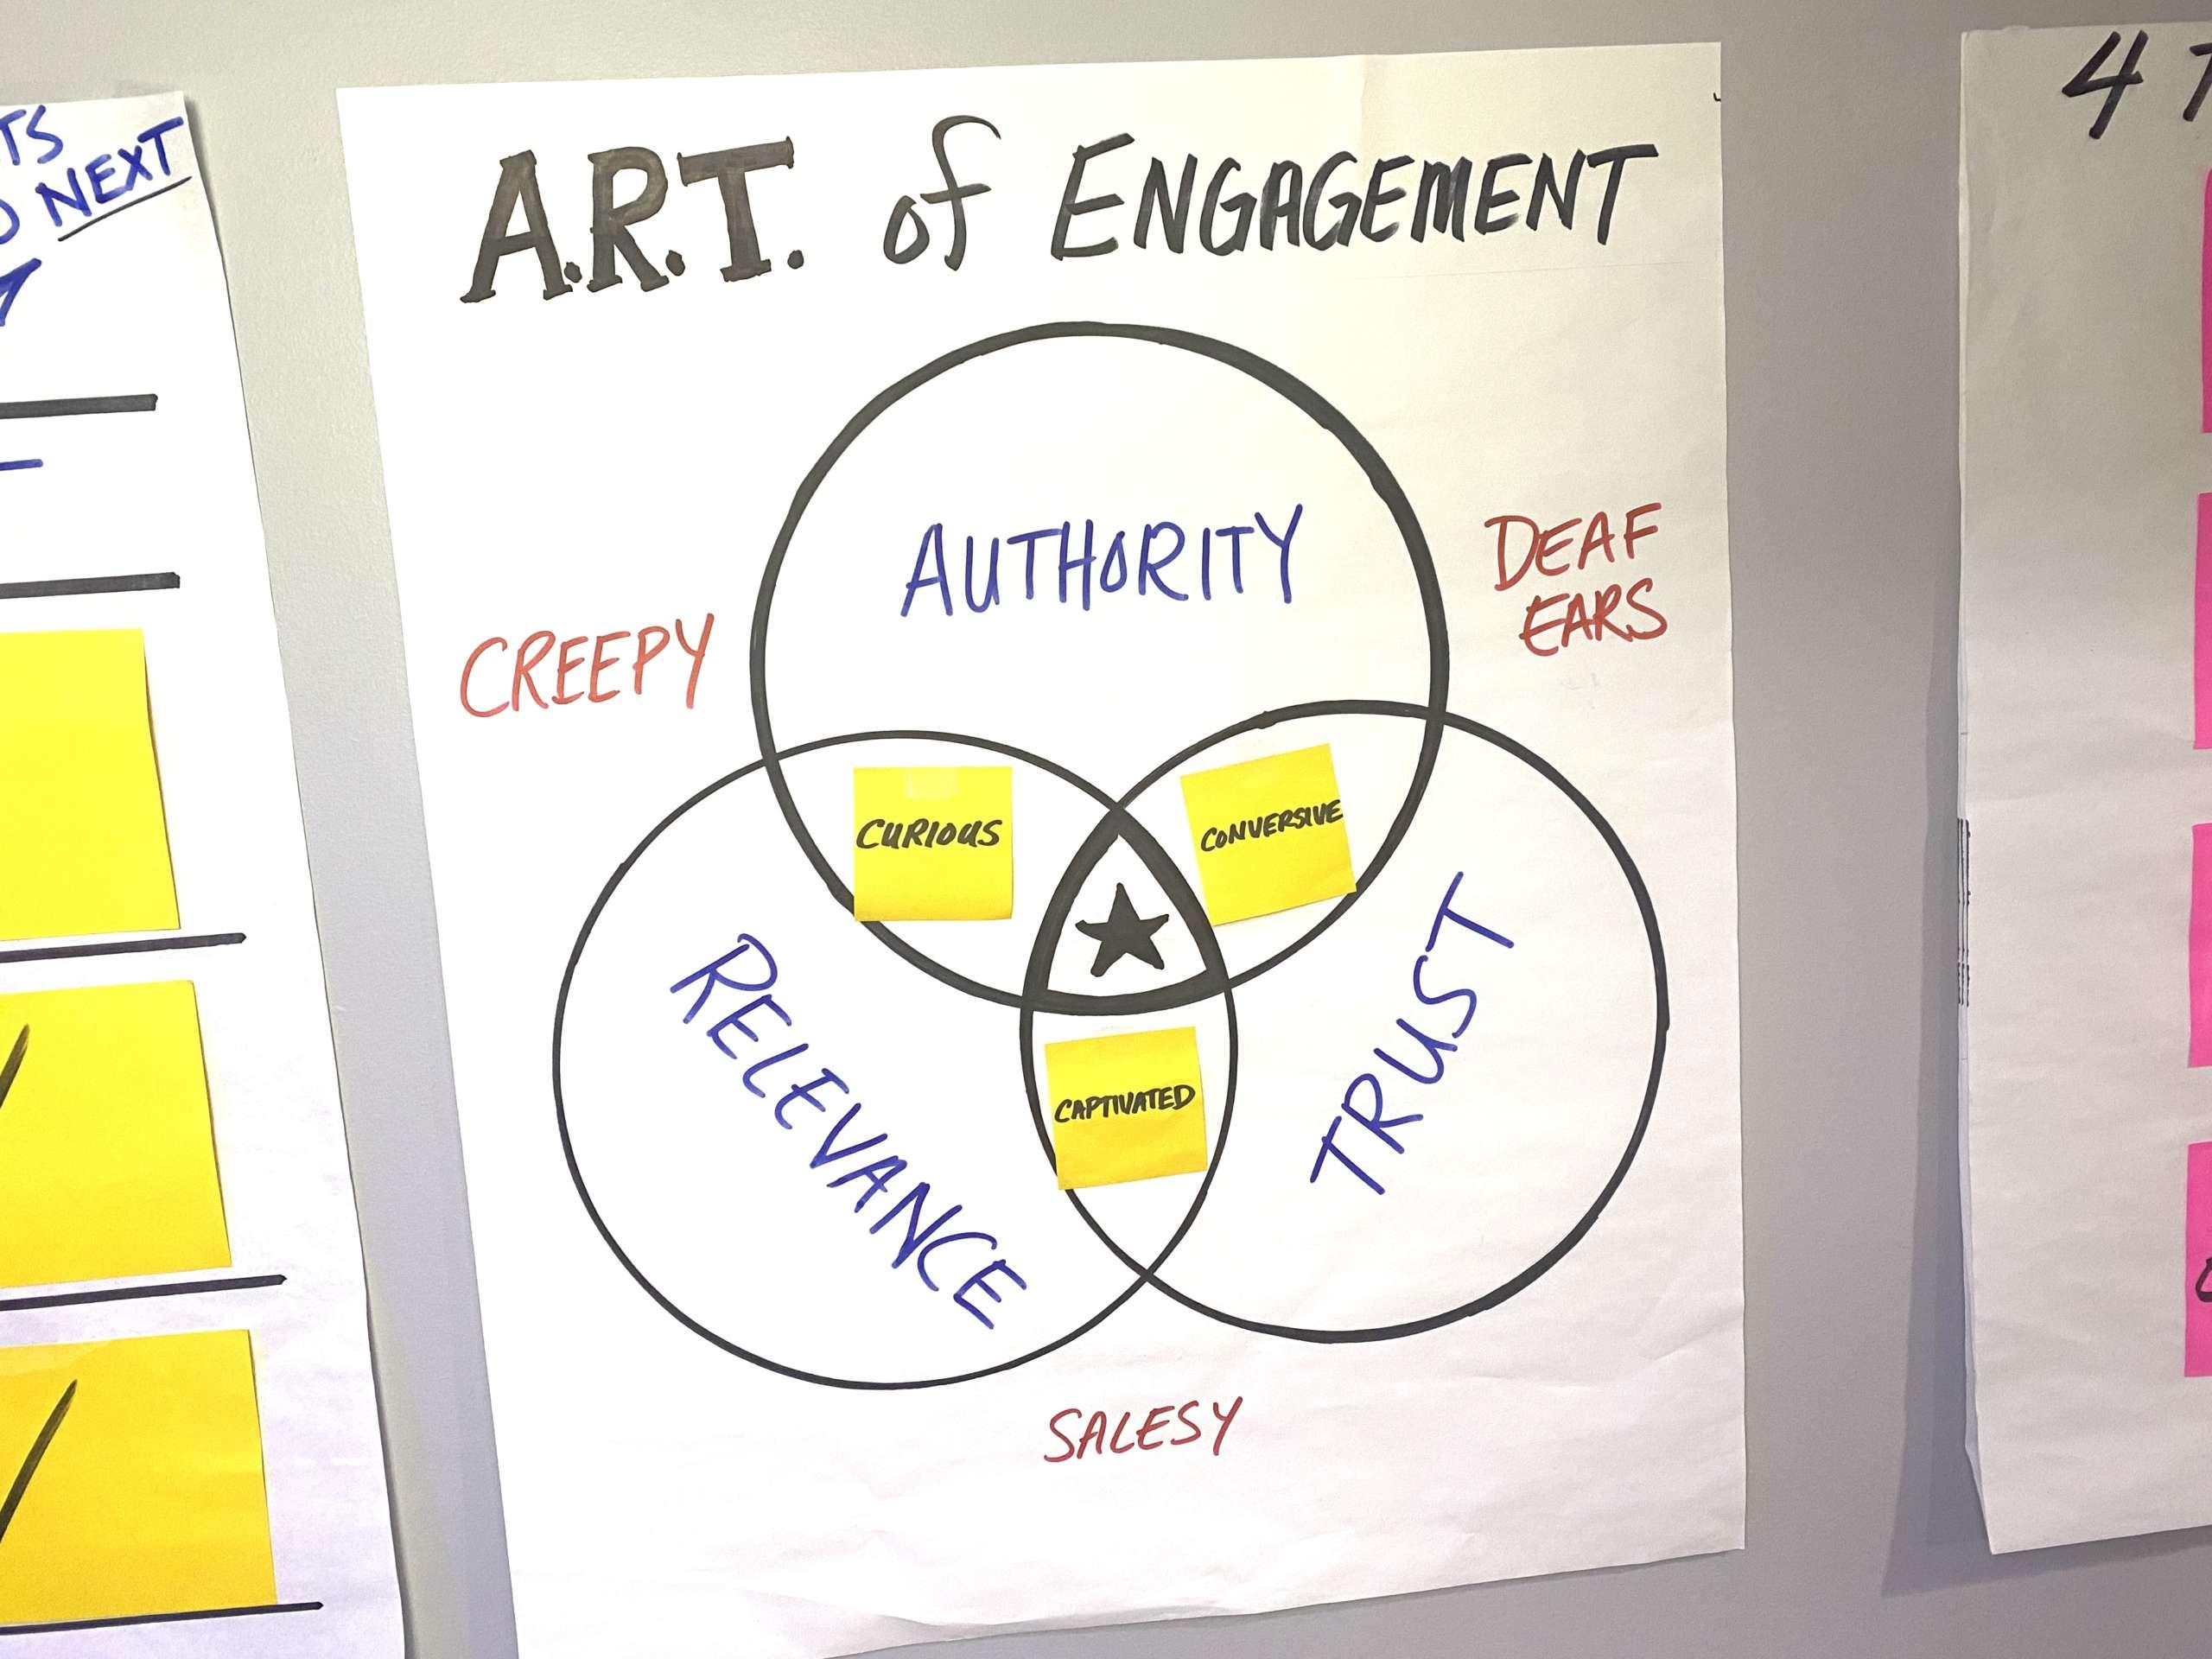 art of engagement content marketing framework